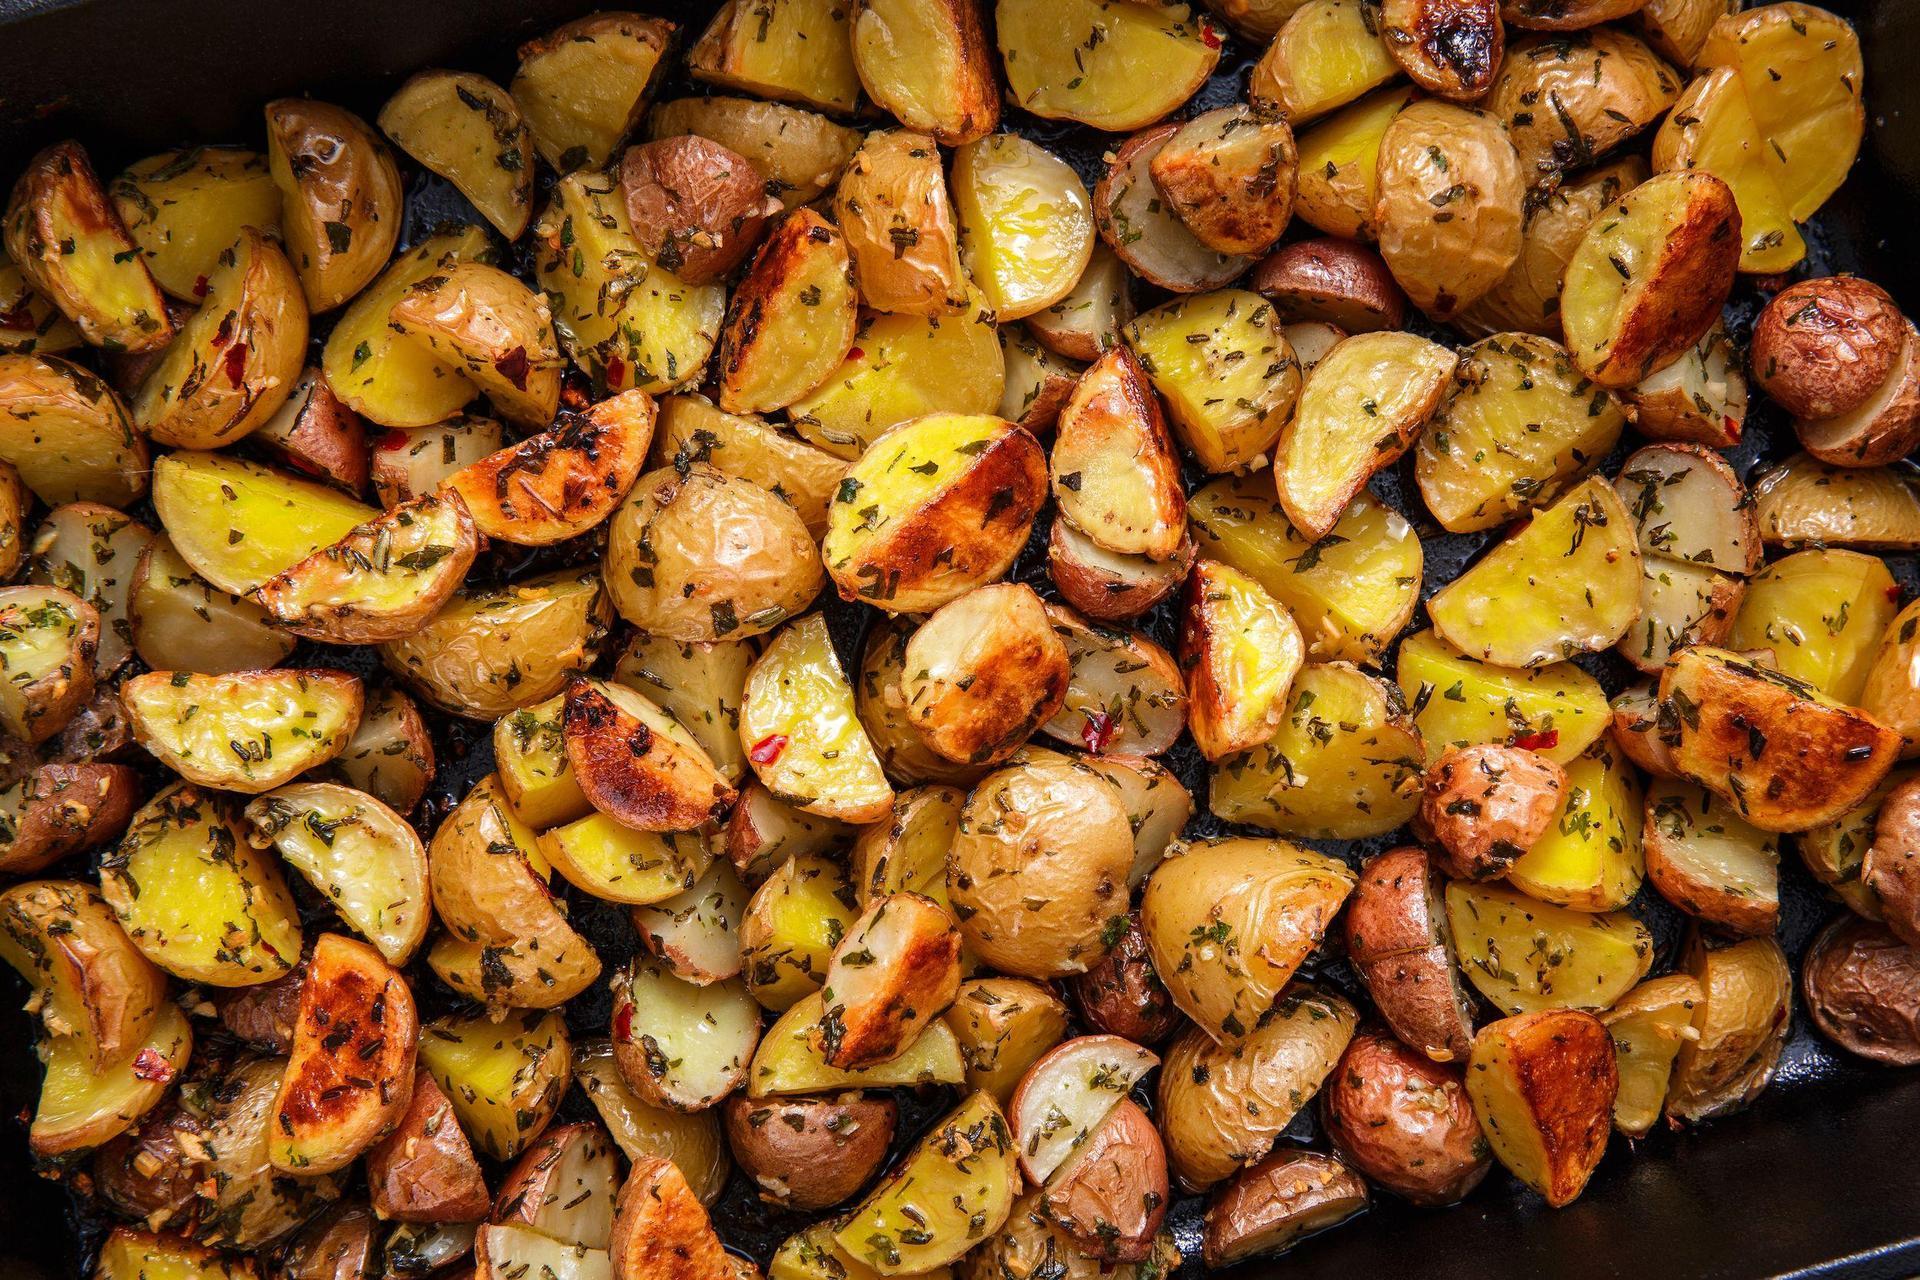 Local Roasted Potatoes